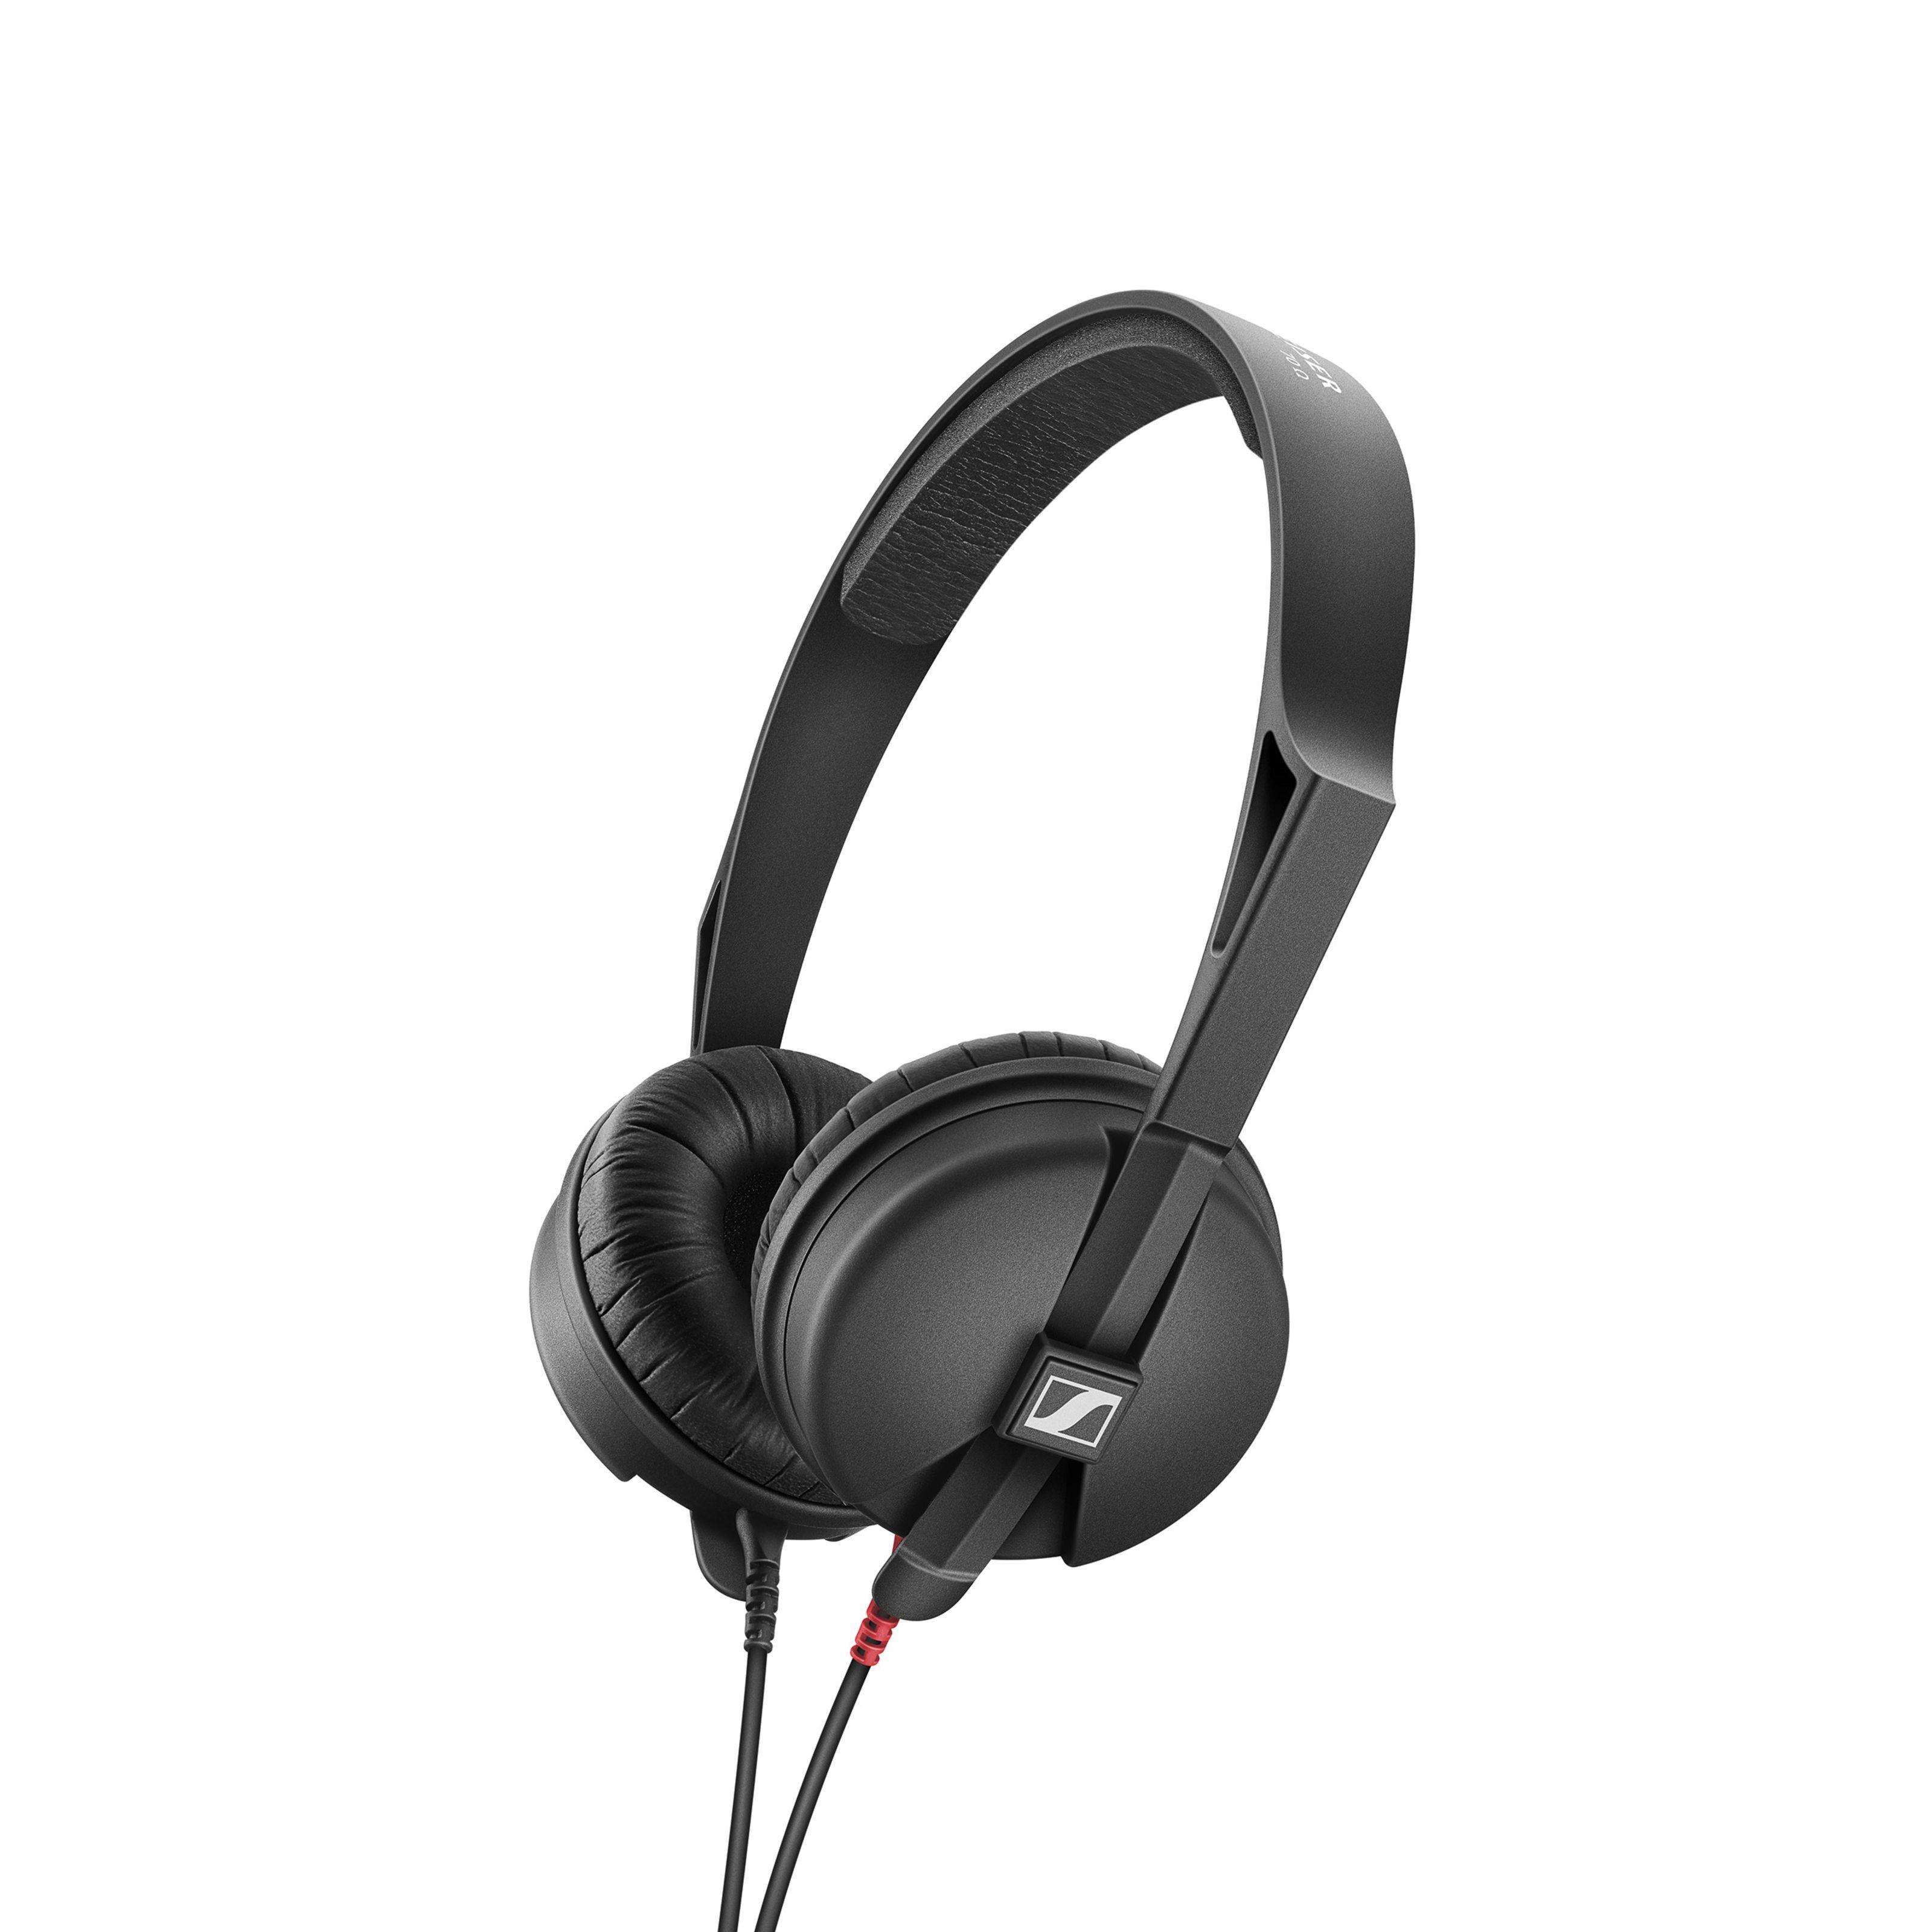 Sennheiser - HD 25 LIGHT geschlossener Kopfhörer